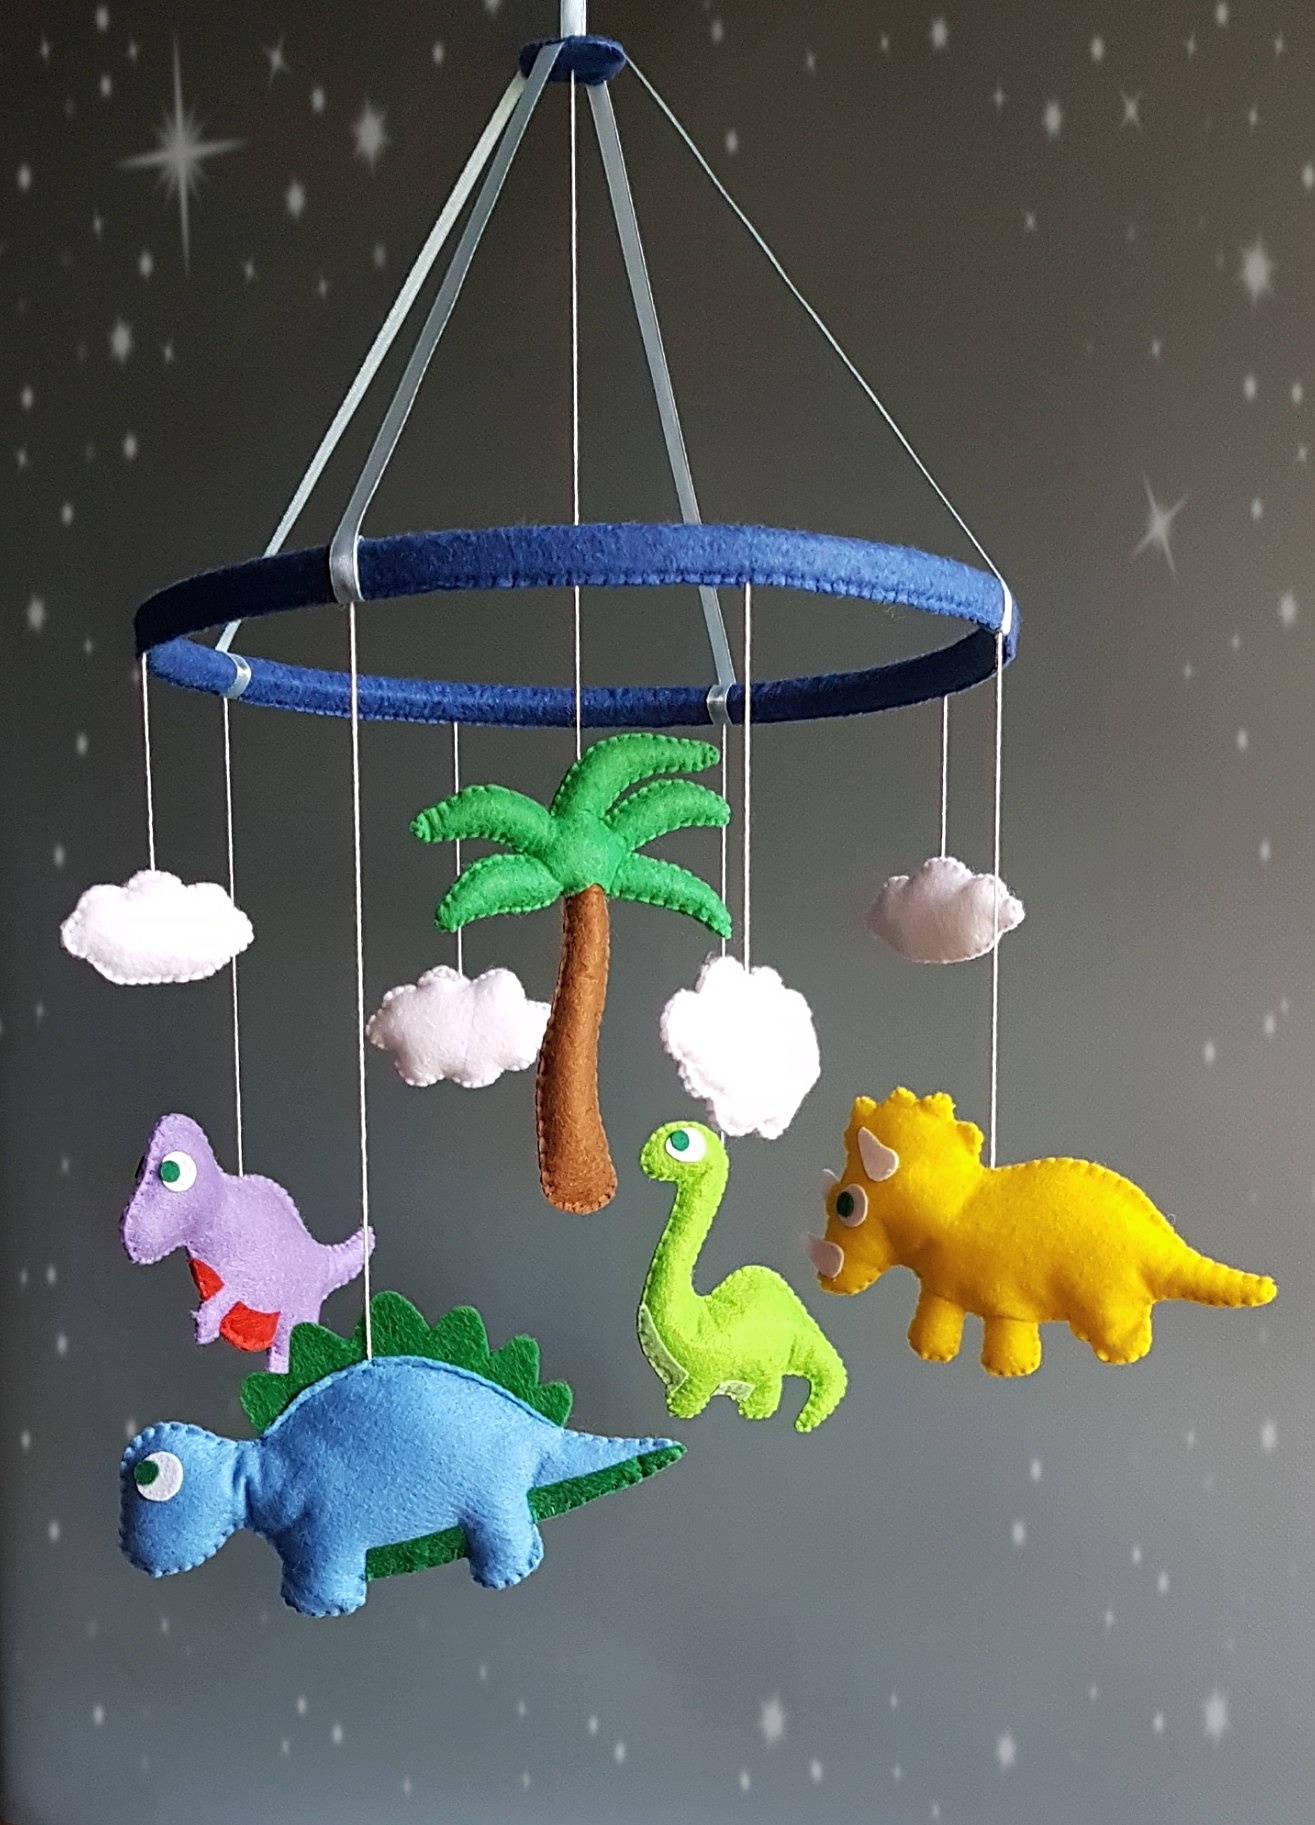 dinosaur baby crib mobile nursery decor felt mobile hanging. Black Bedroom Furniture Sets. Home Design Ideas